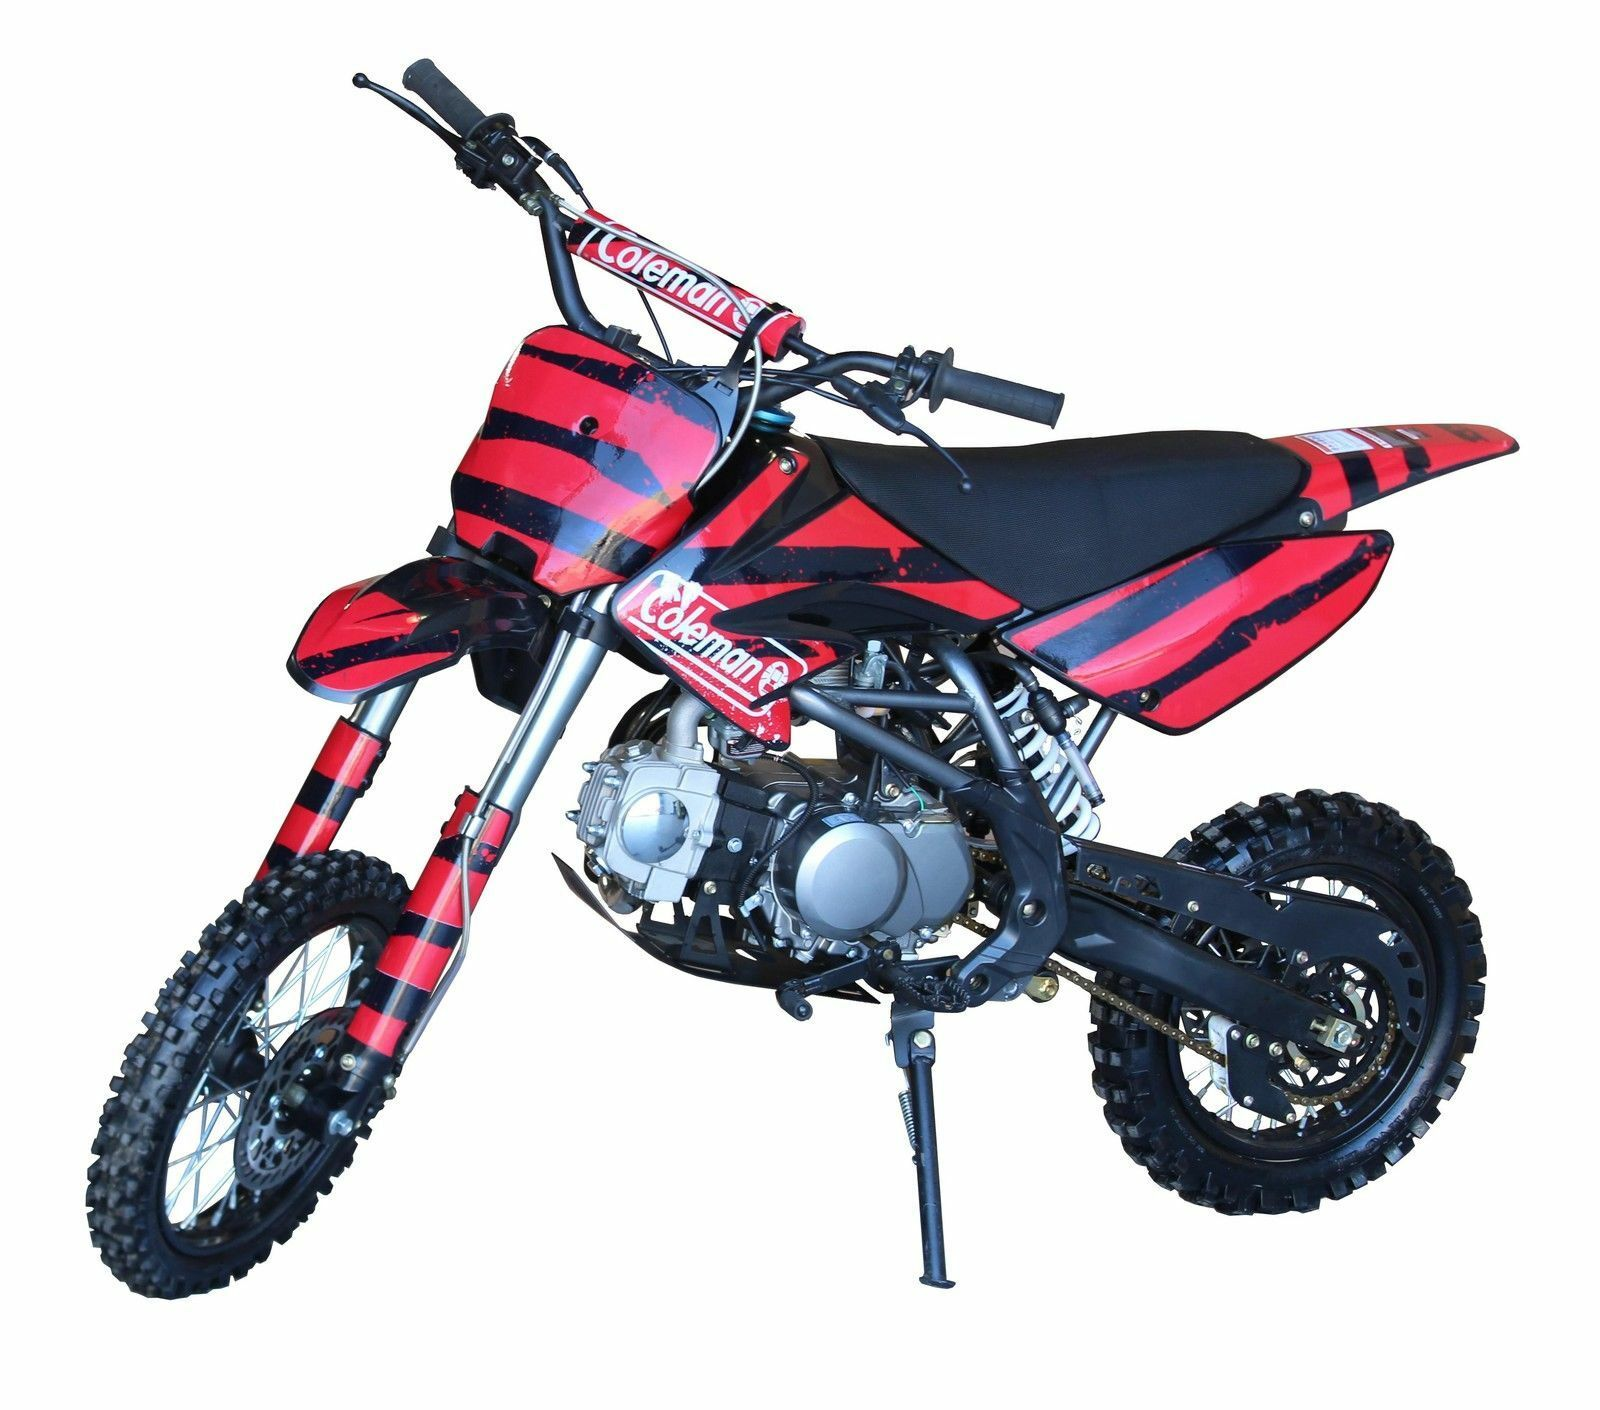 Hm parts pit bike monkey dax sprocket 4 x screw brake disc 8 x 23 mm